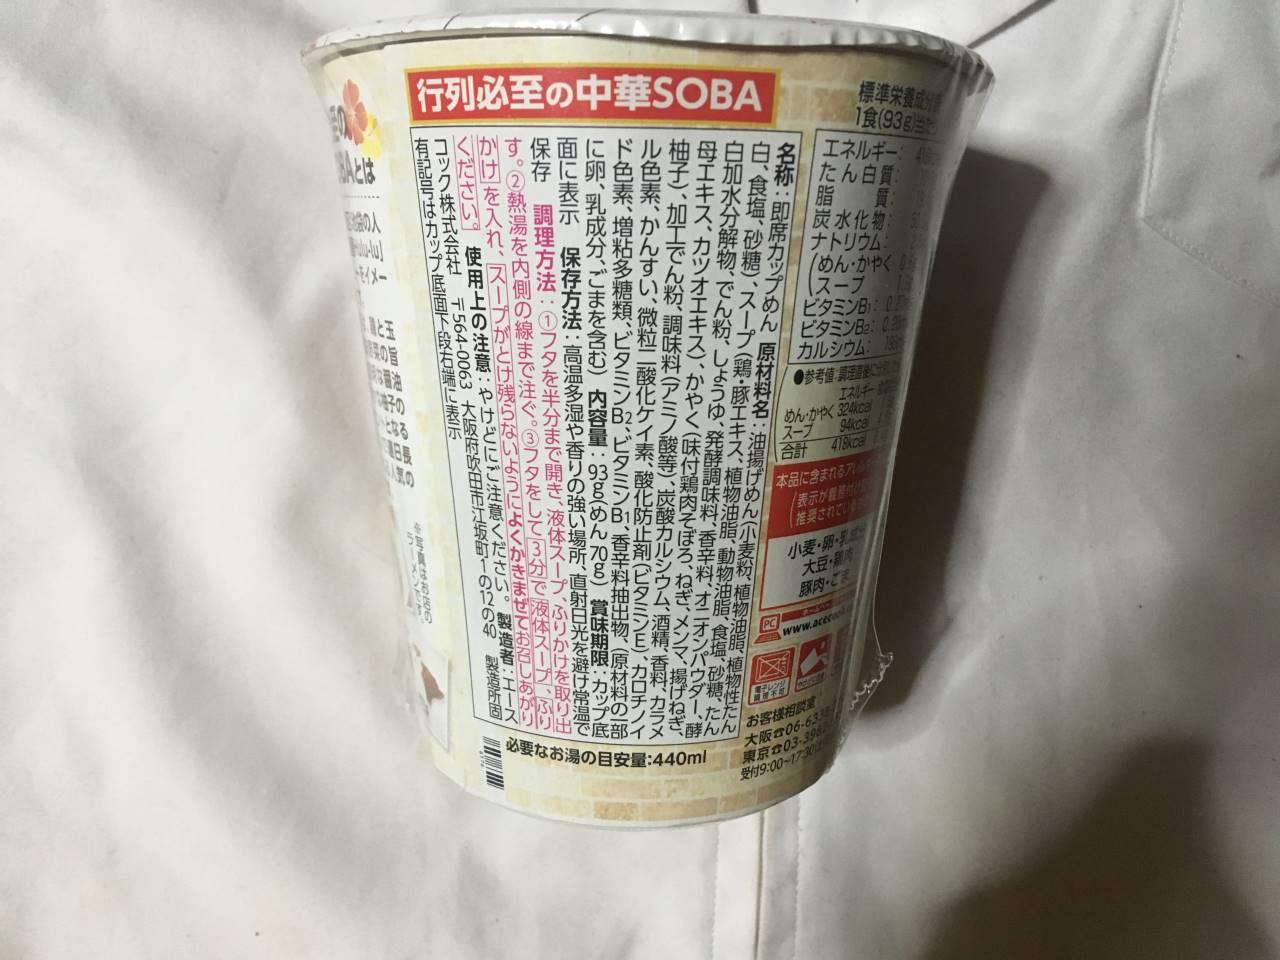 原材料表示|エースコック「東京・池袋 Hulu-lu監修の一杯行列必死の中華SOBA」